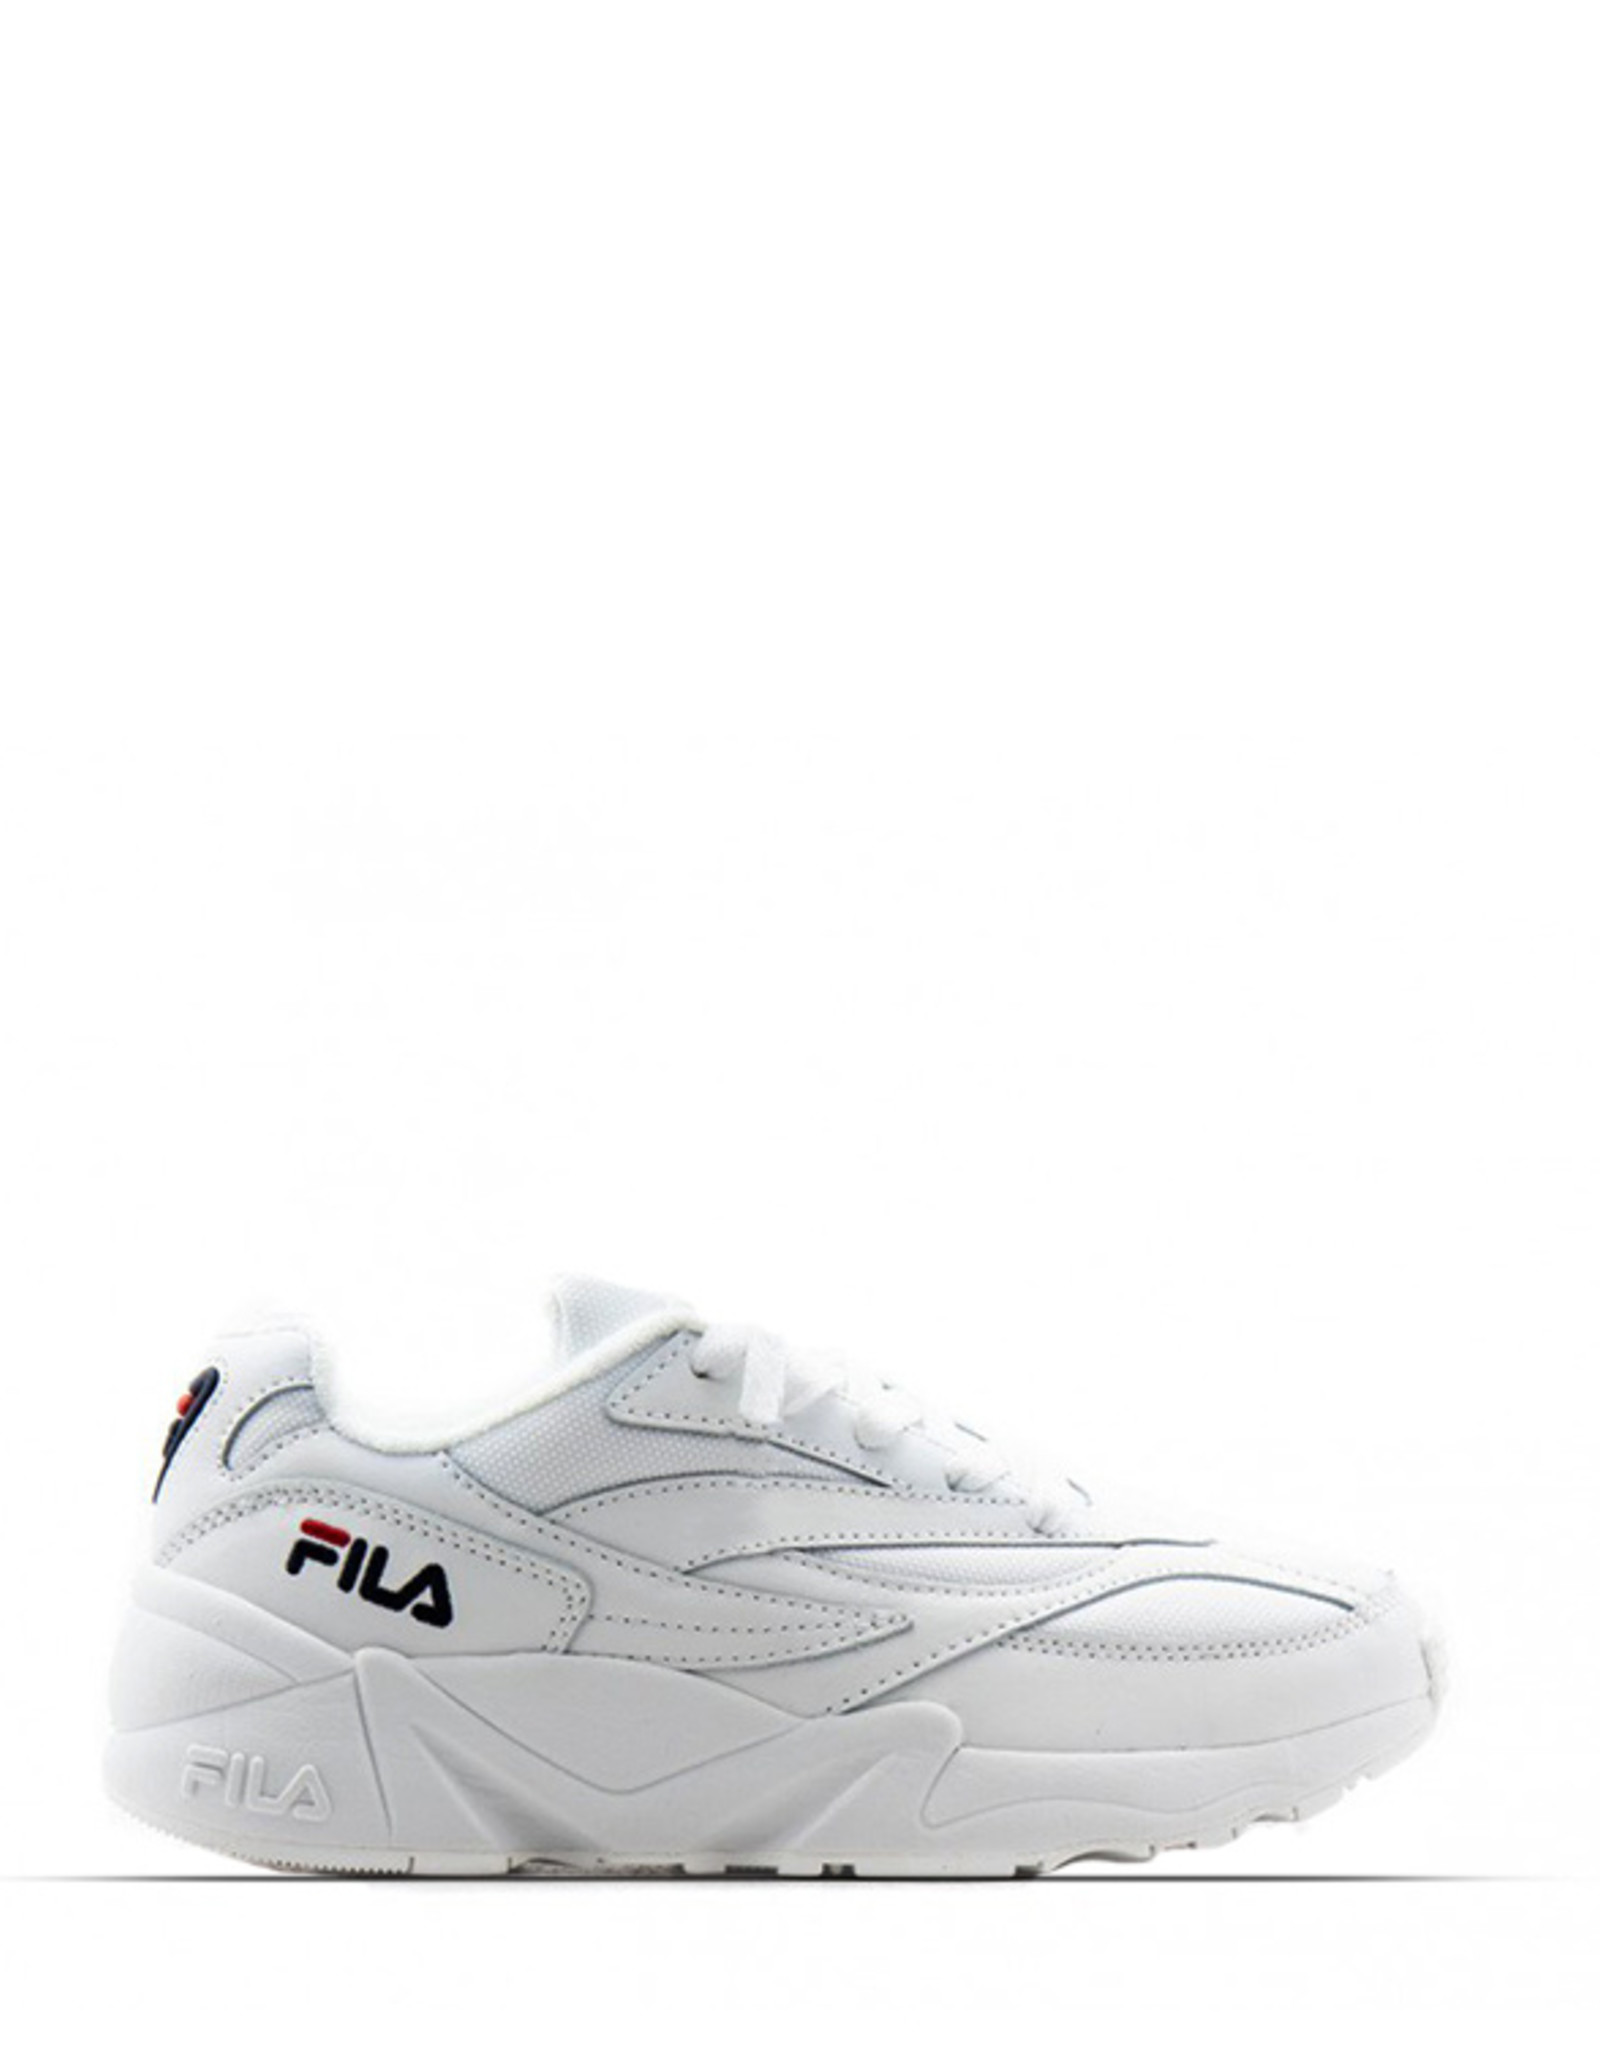 FILA V94M LOW WHITE